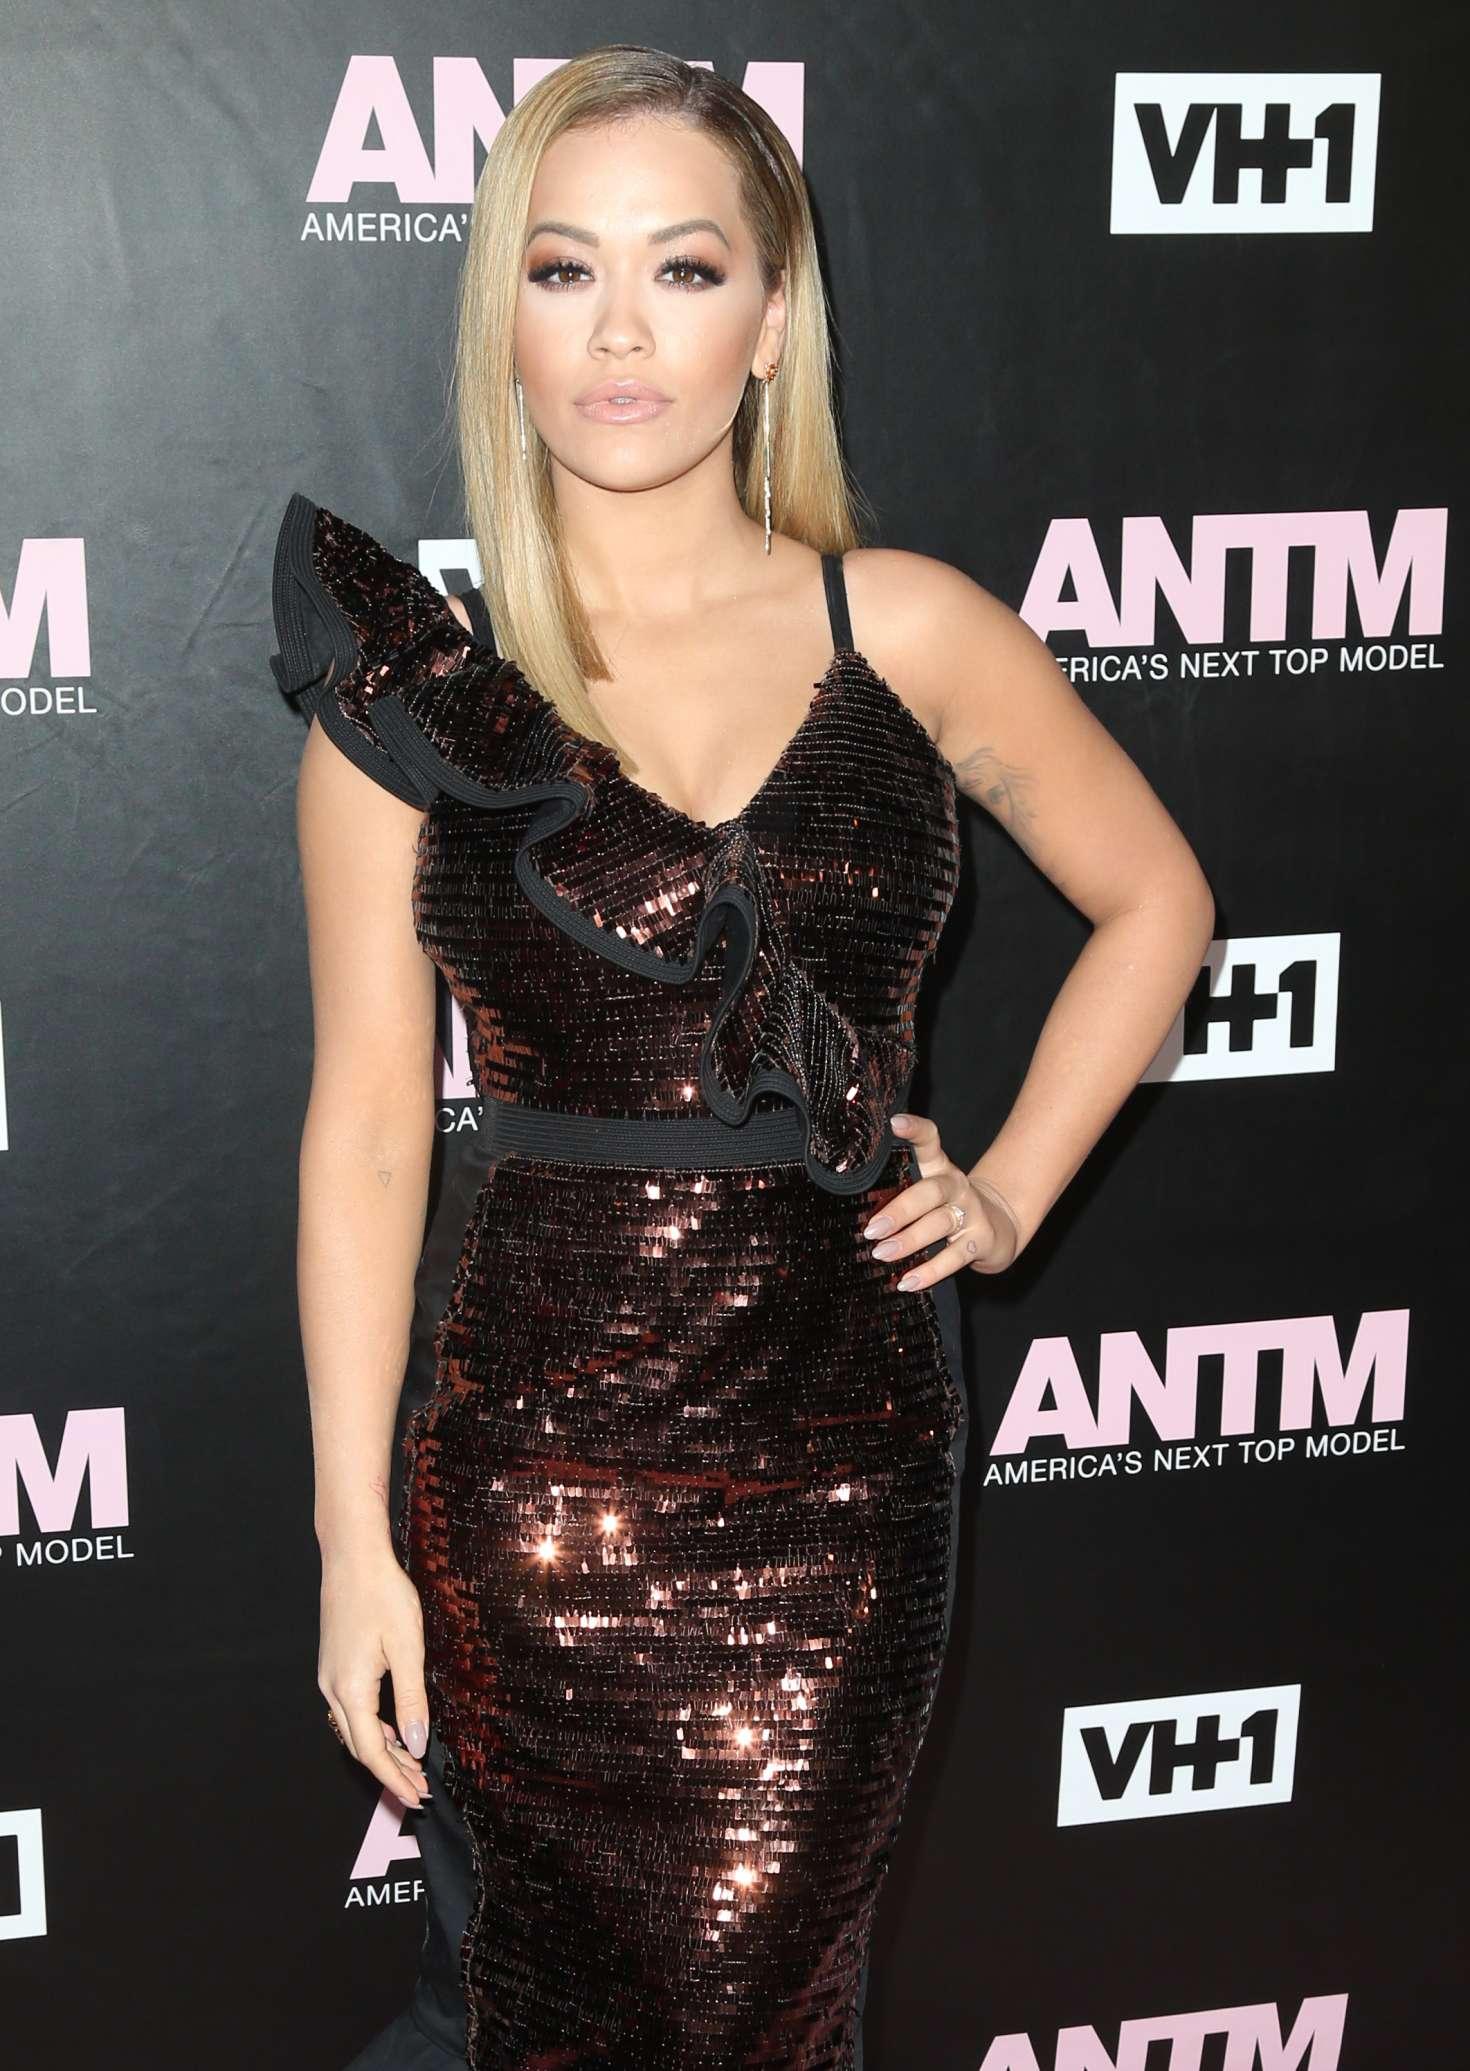 Rita Ora 2016 : Rita Ora: Americas Next Top Model Premiere Party -37